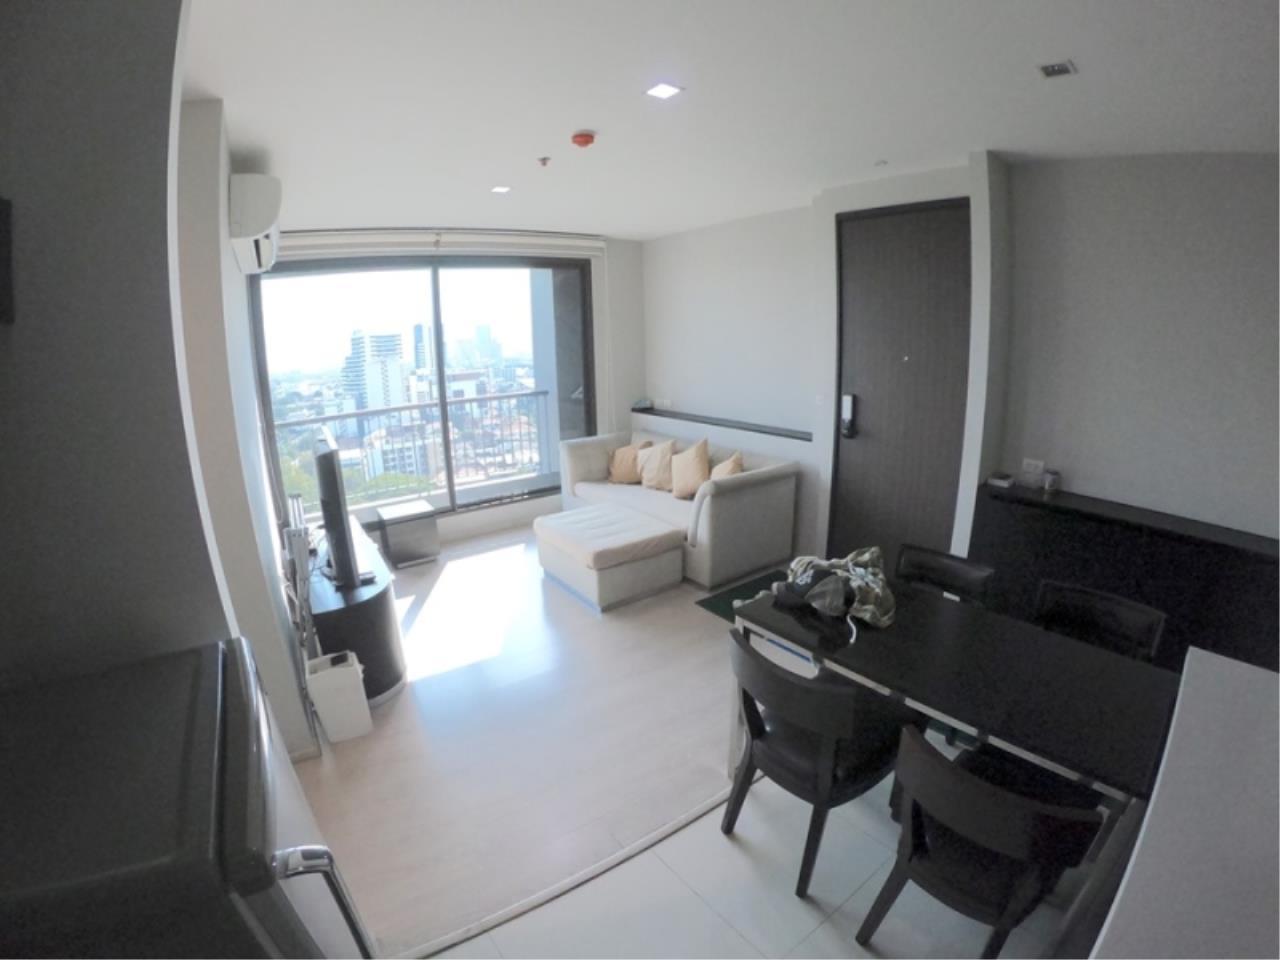 Century21 Skylux Agency's Rhythm Sukhumvit 44/1 / Condo For Sale / 2 Bedroom / 52.2 SQM / BTS Phra Khanong / Bangkok 7